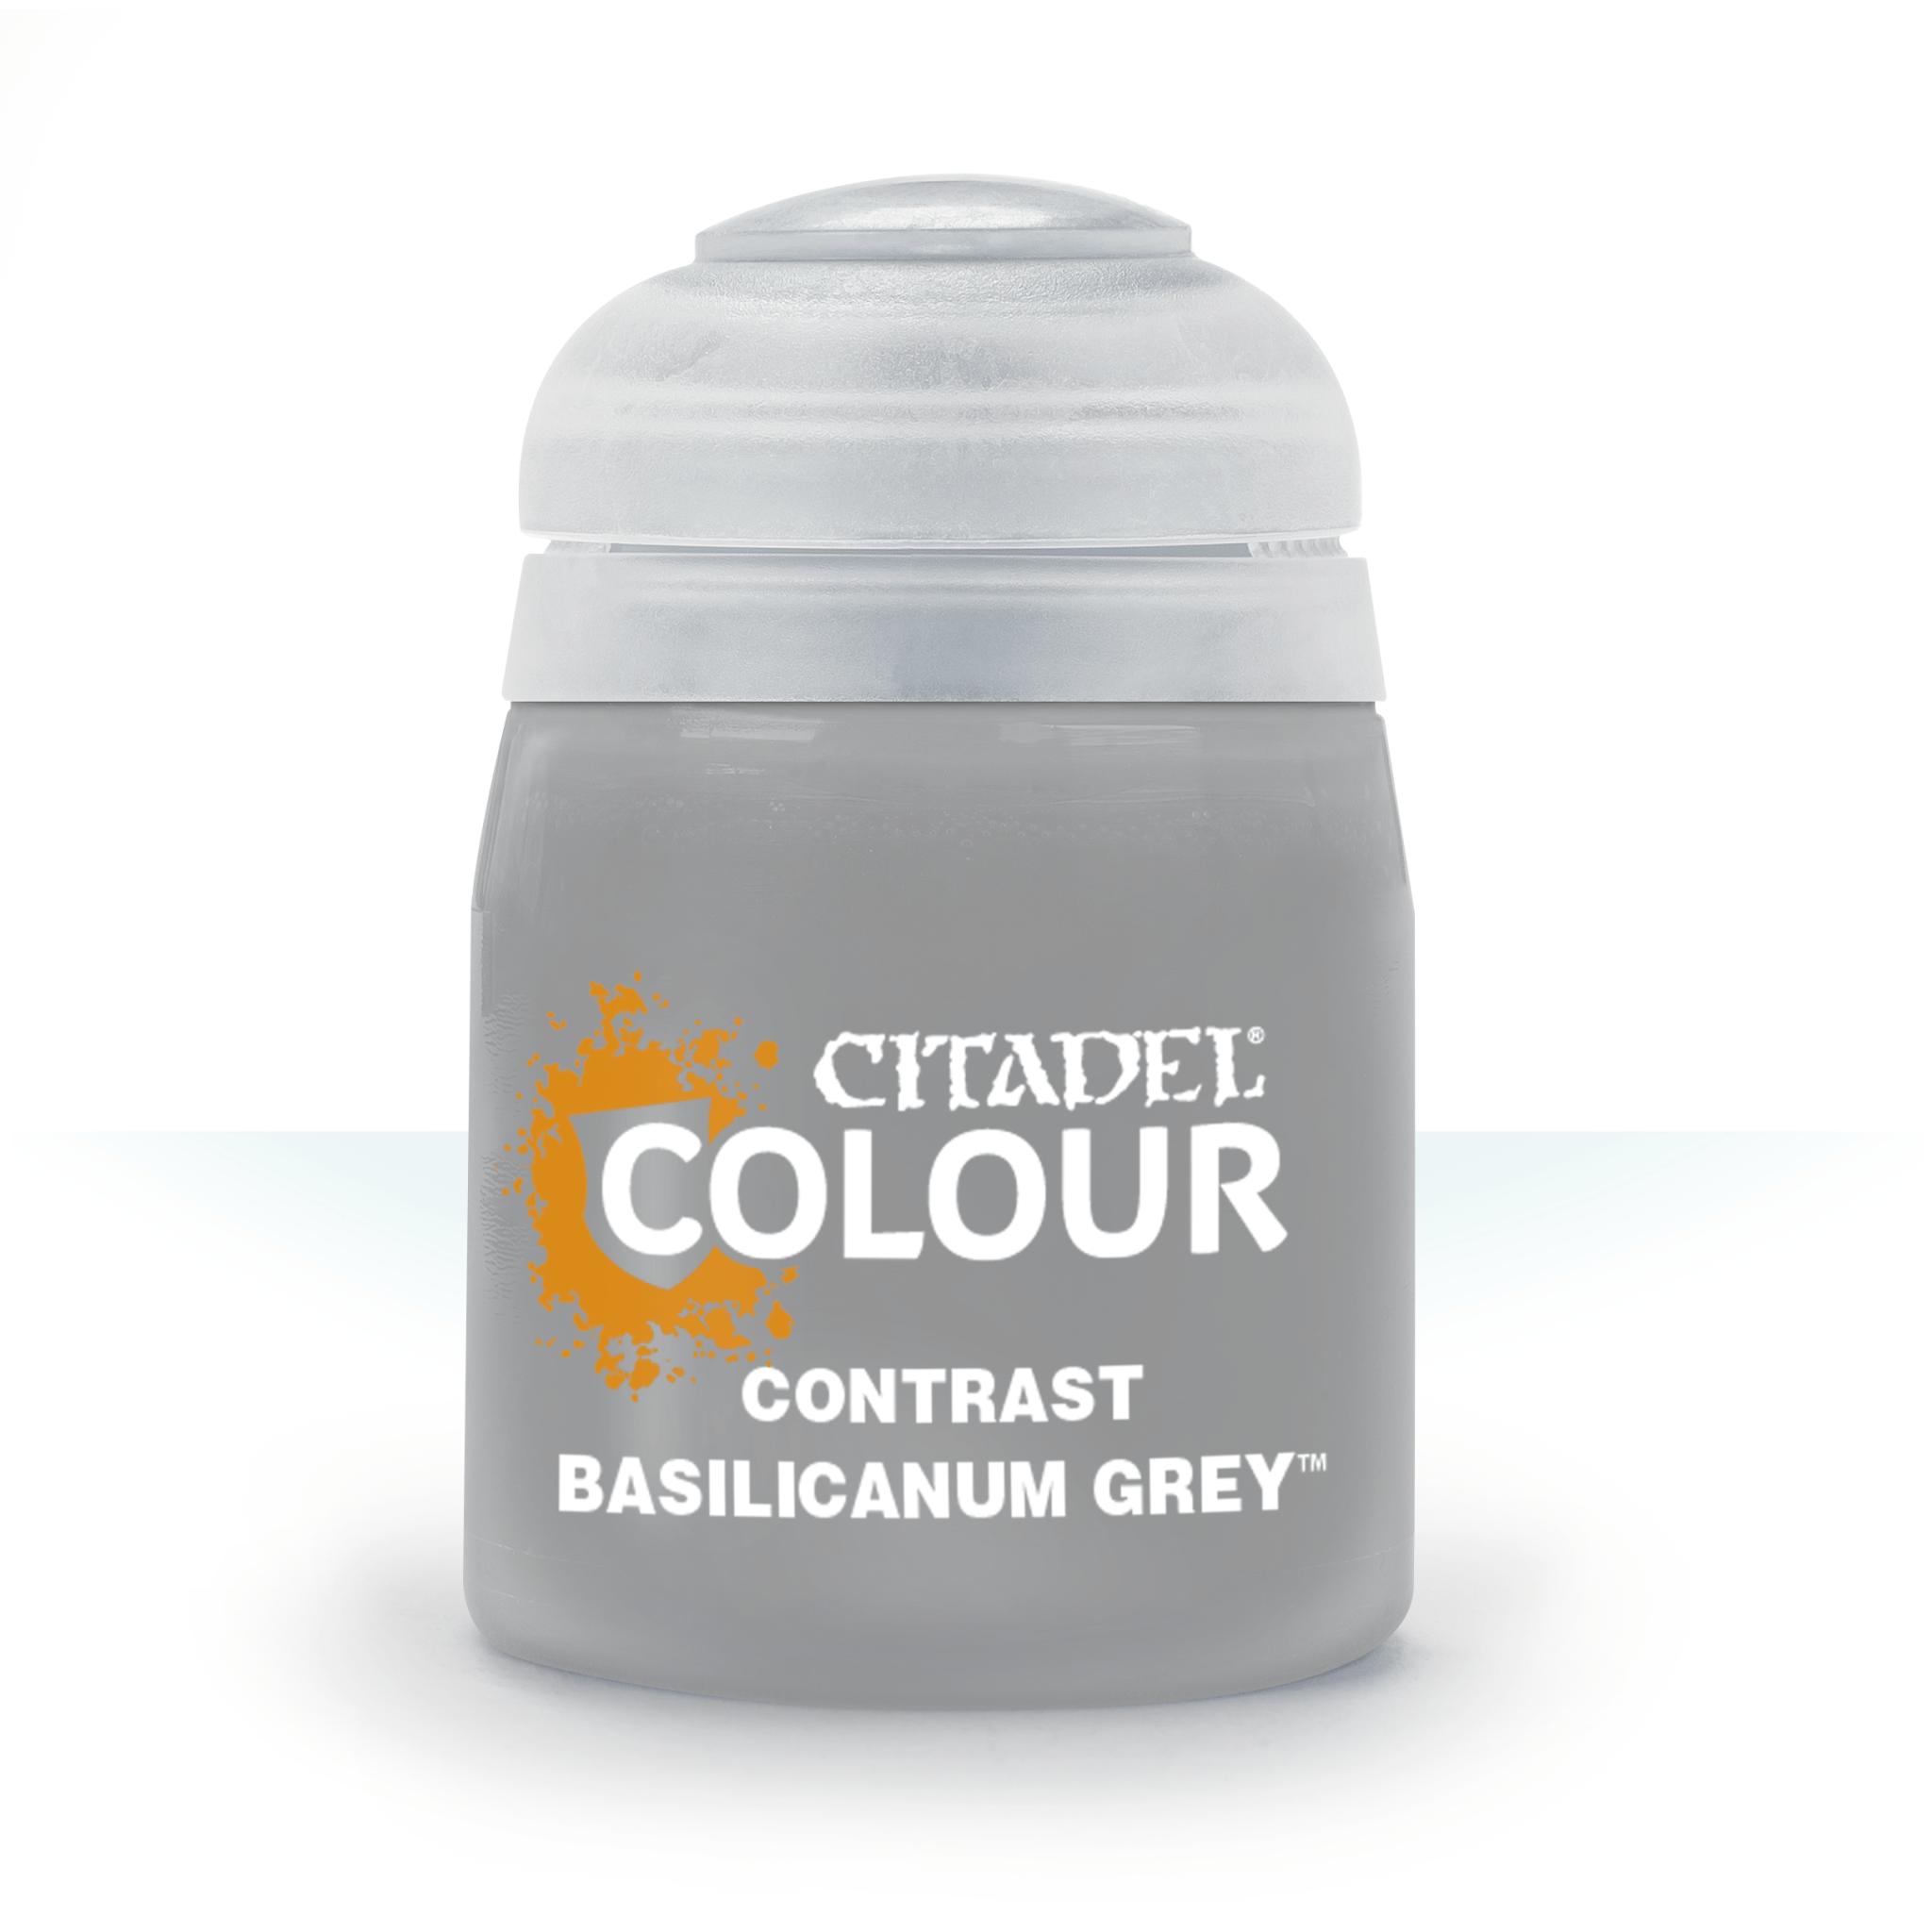 Basilicanum Grey (Contrast 18ml)